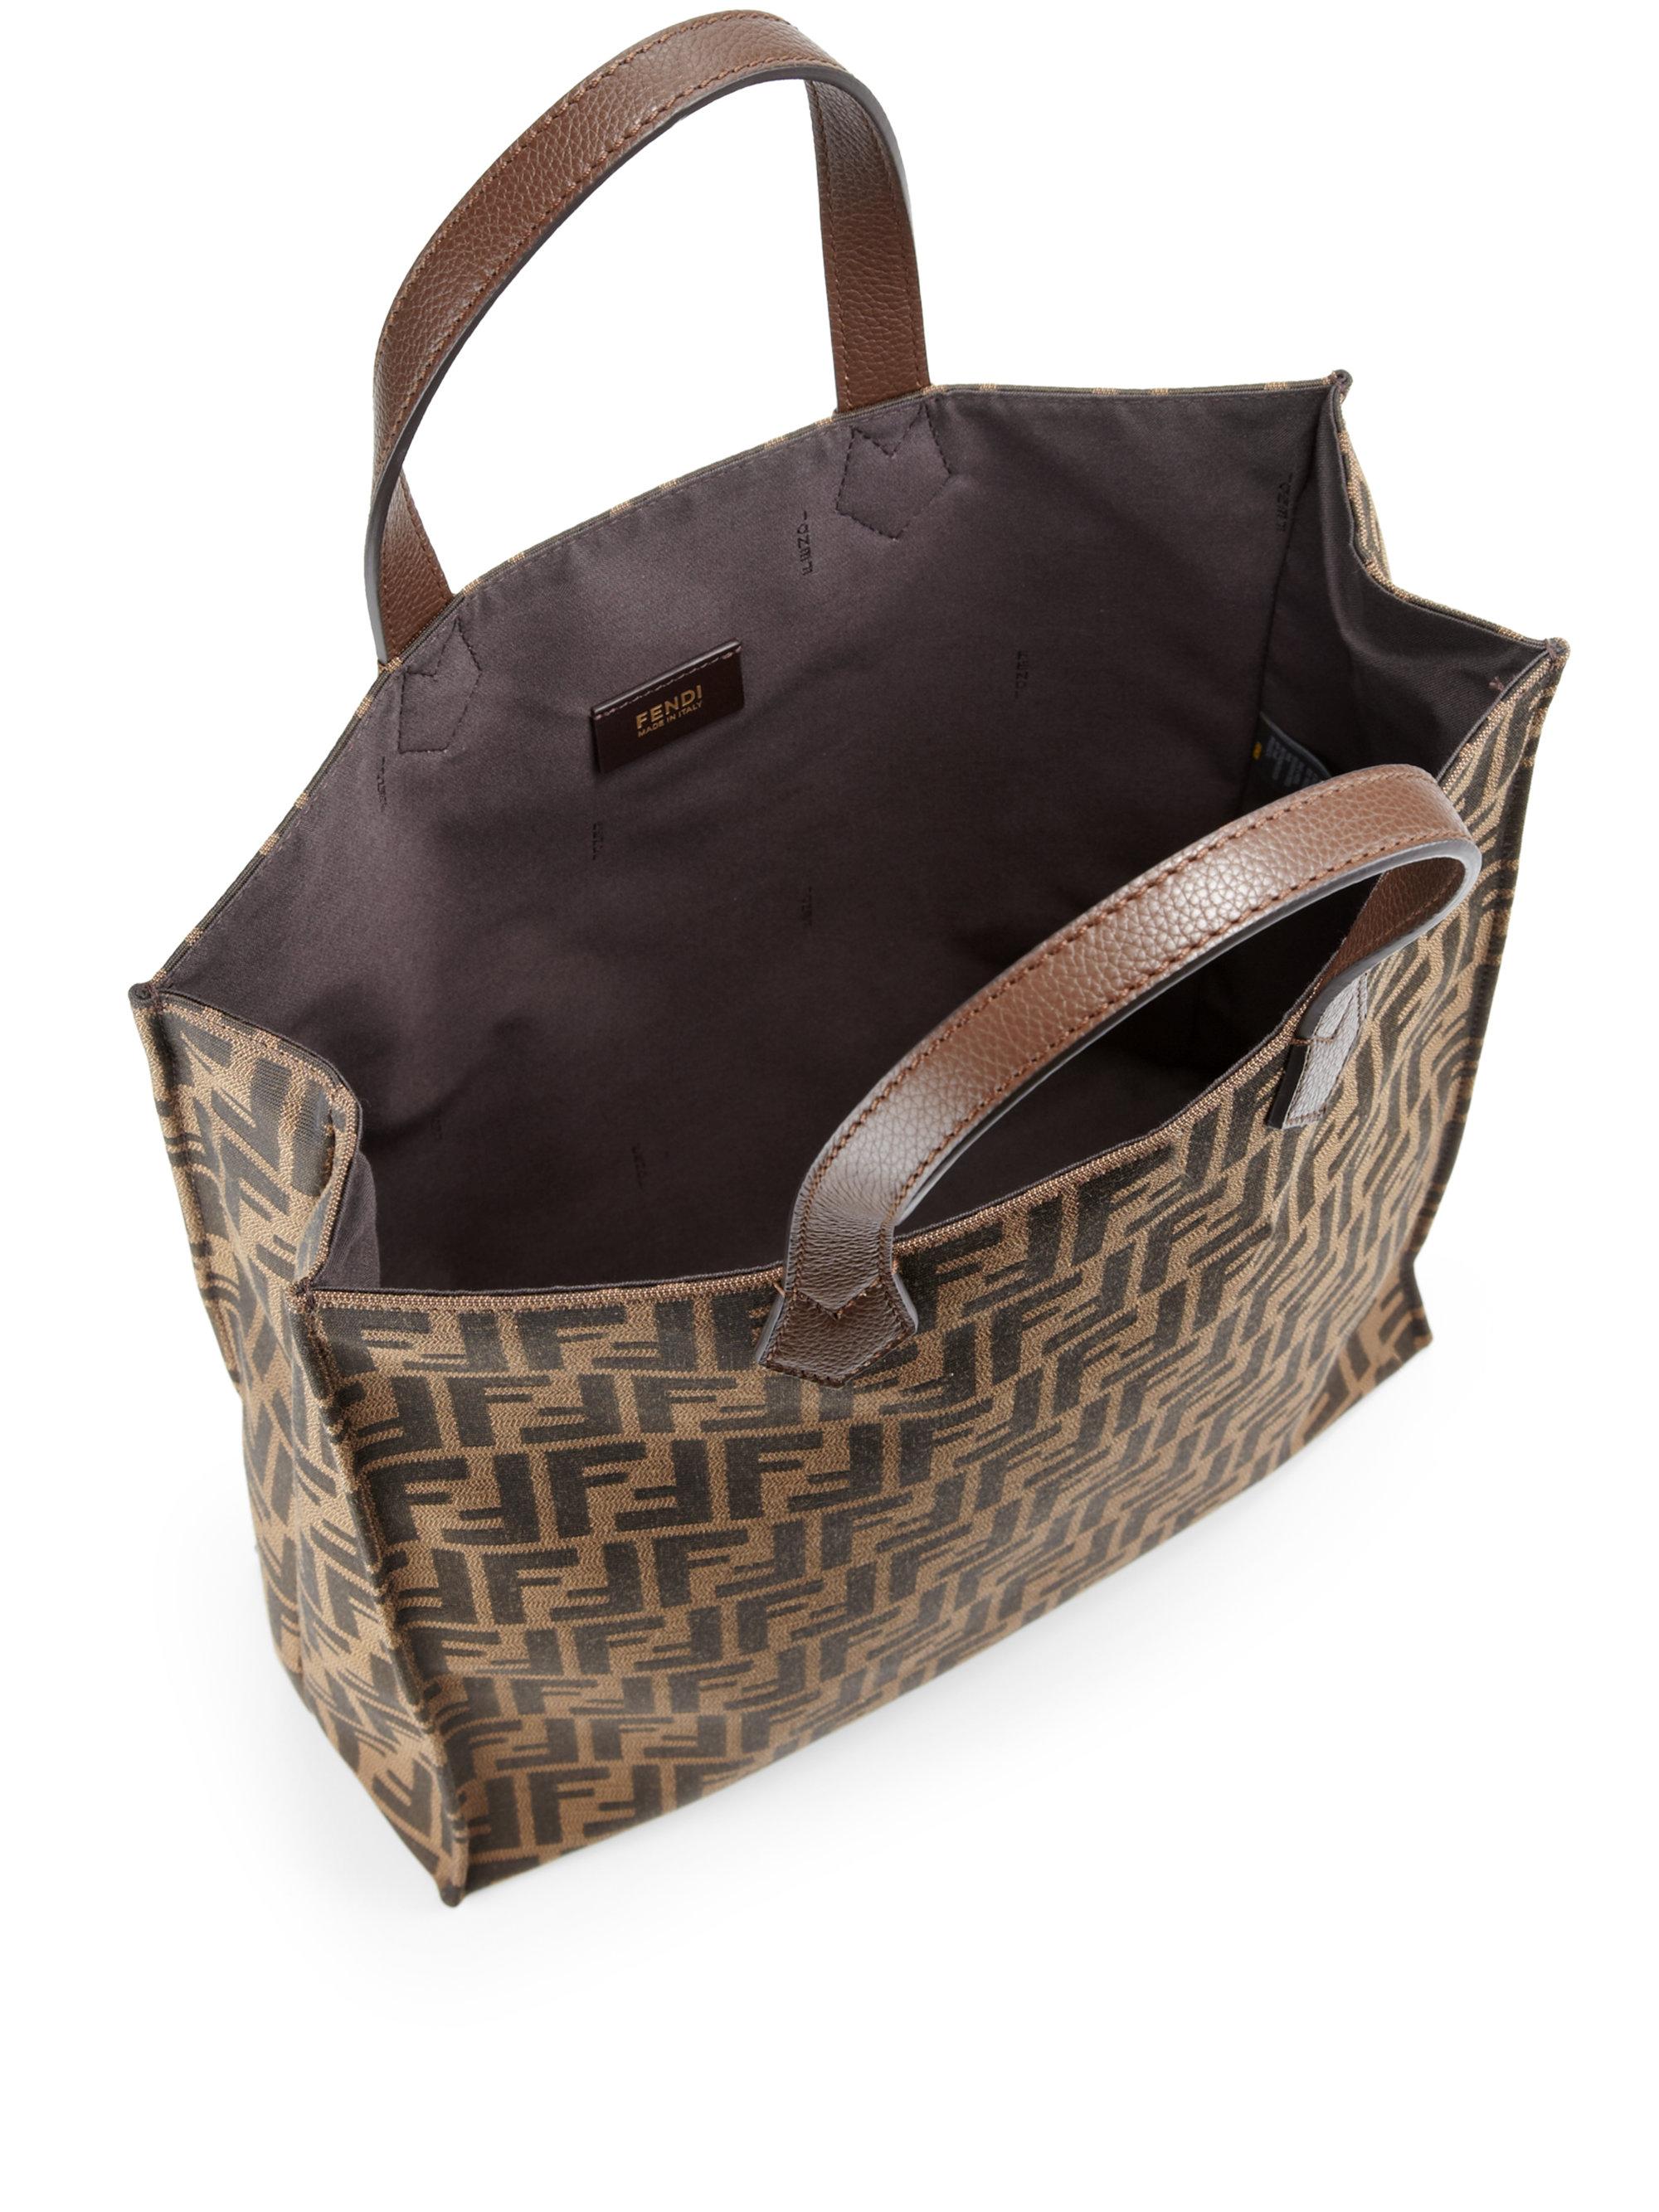 Fendi Signature Monogram Shopping Bag In Brown Lyst